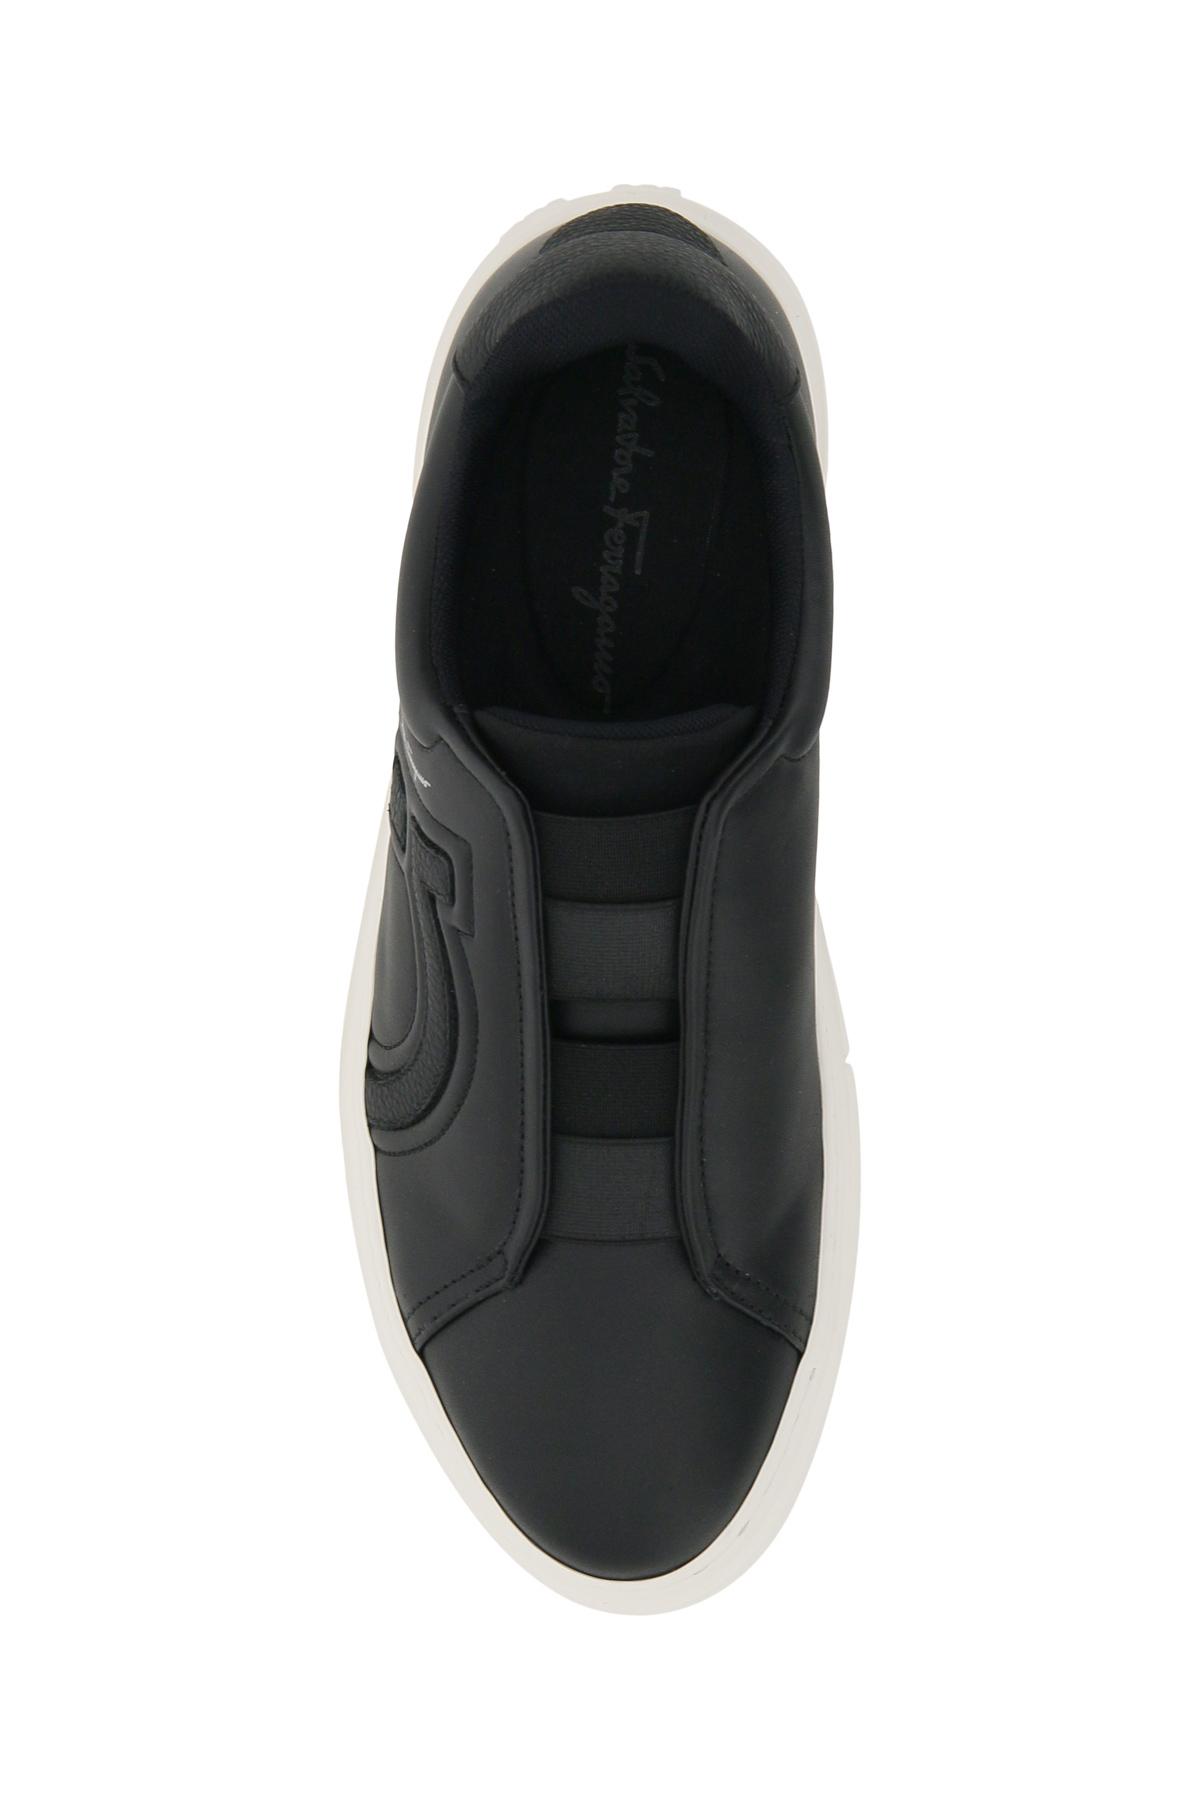 Salvatore ferragamo sneakers slip-on tasko